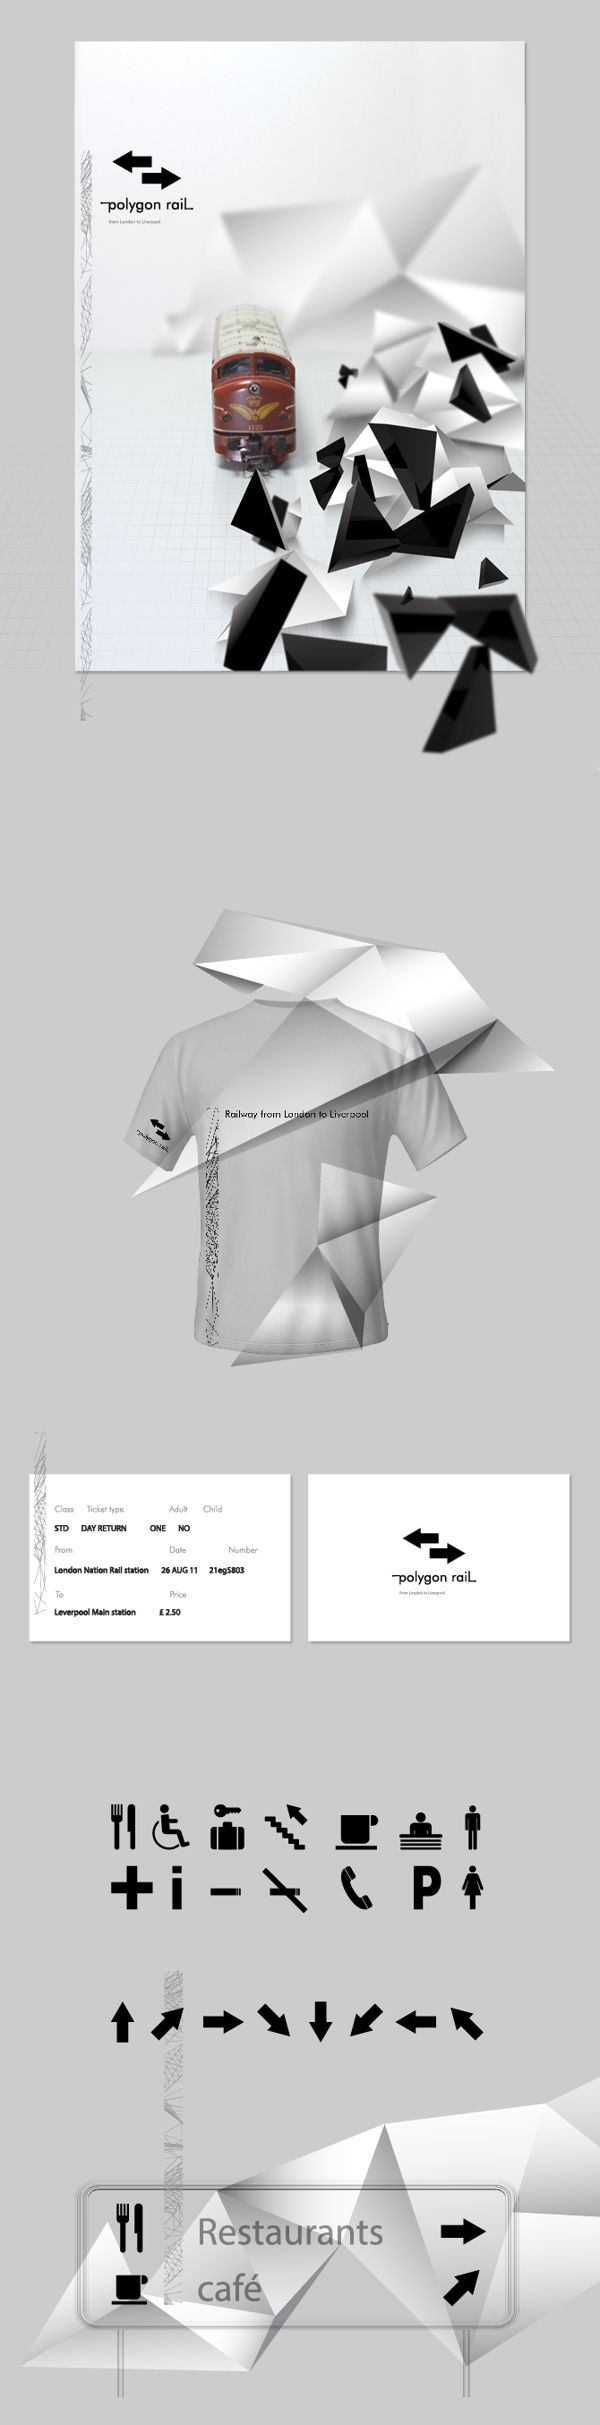 Polygon rail by Martin Kraus, via Behance